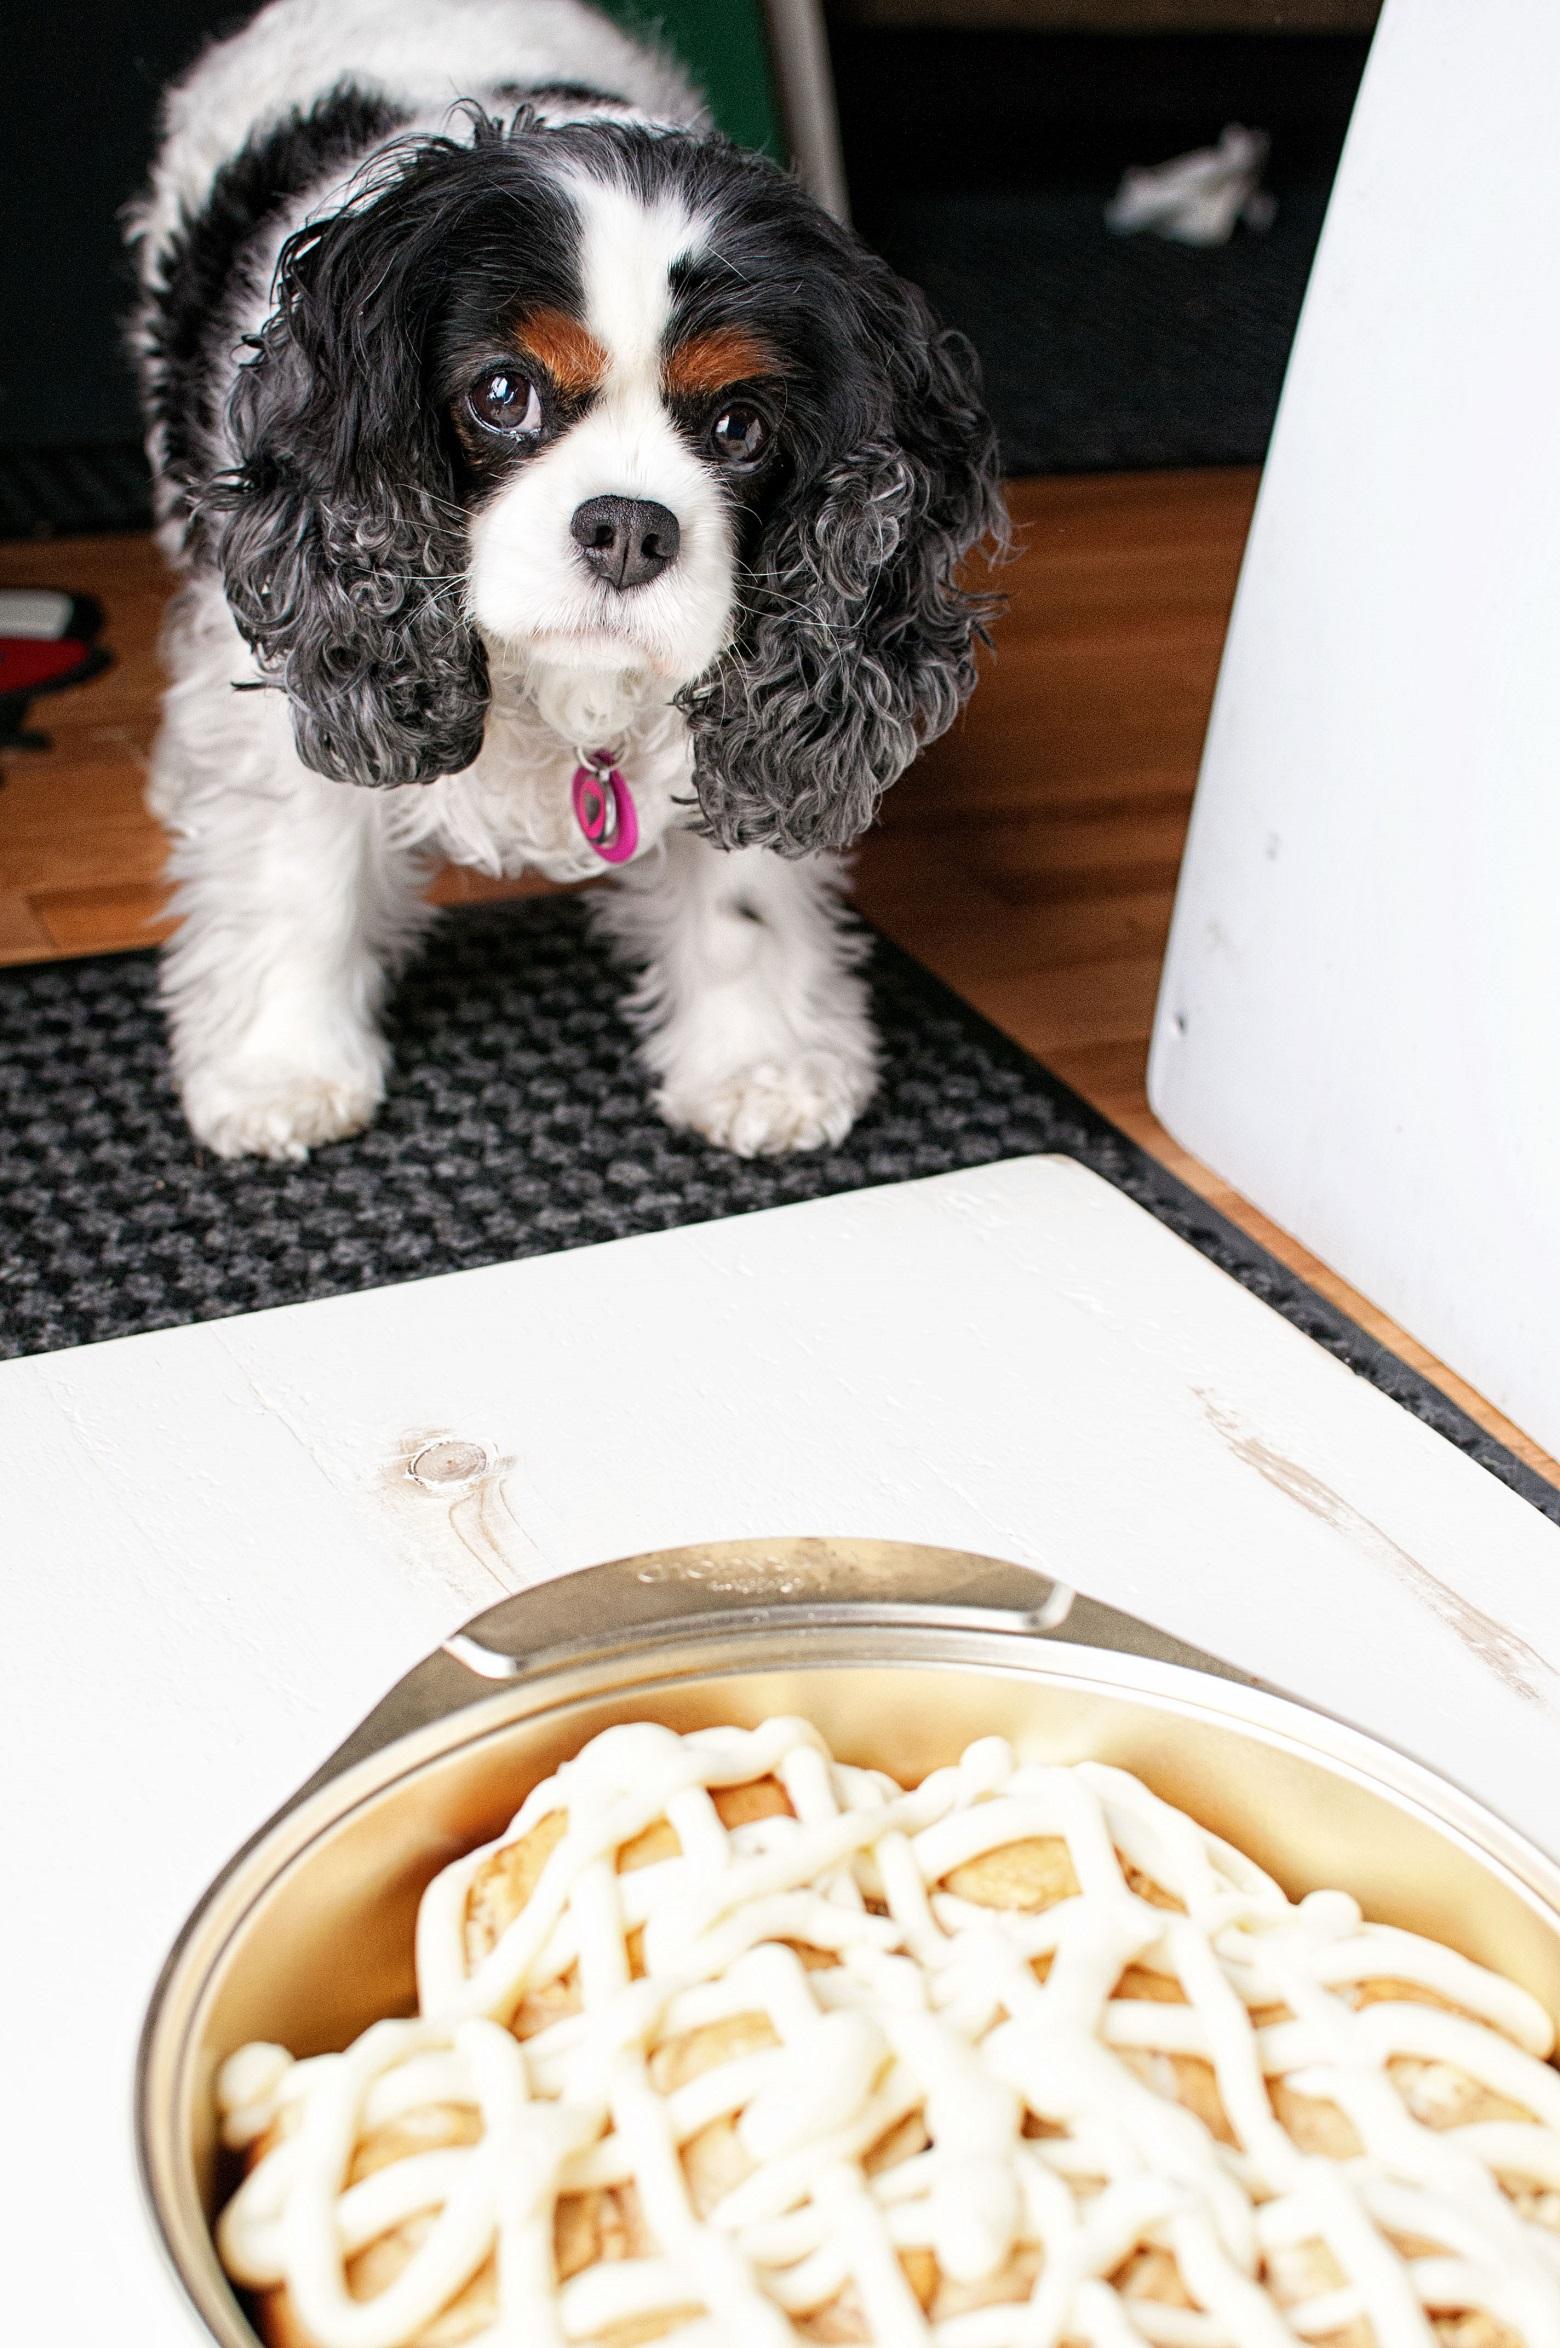 Crissy the kitchen helper.